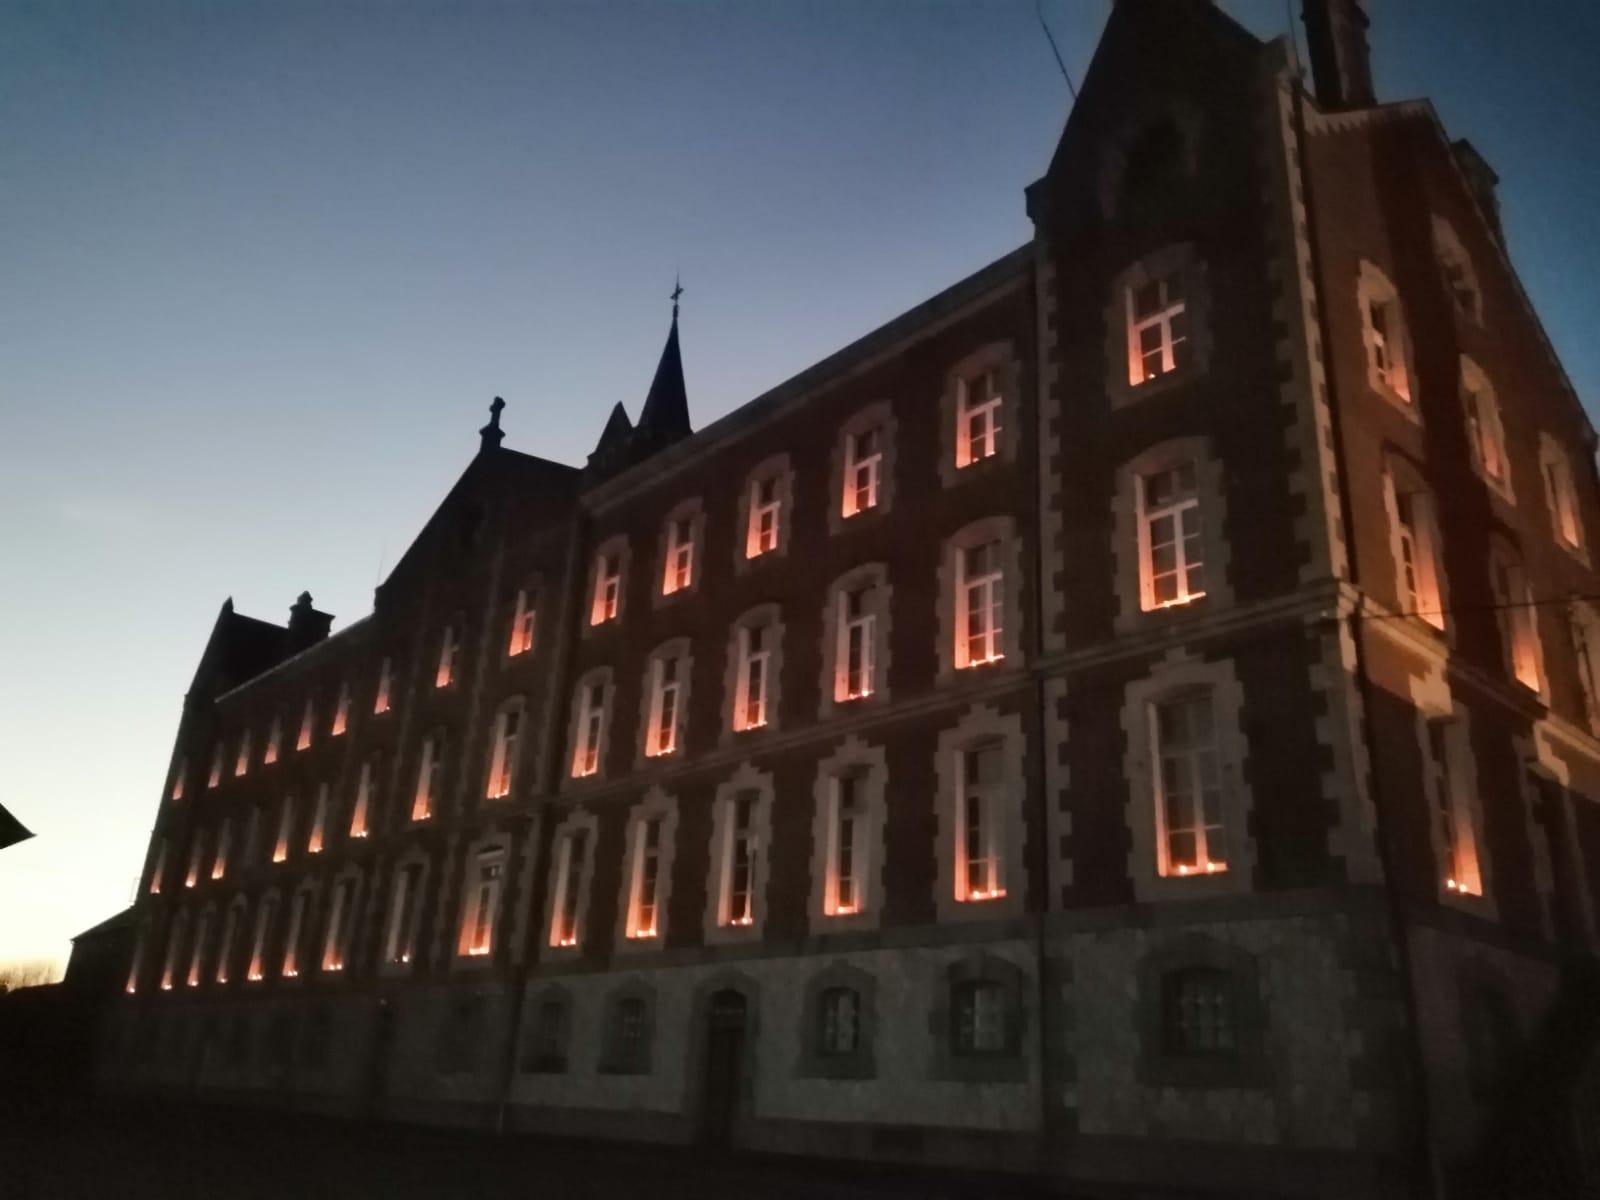 Maison sainte Marie illuminée 1